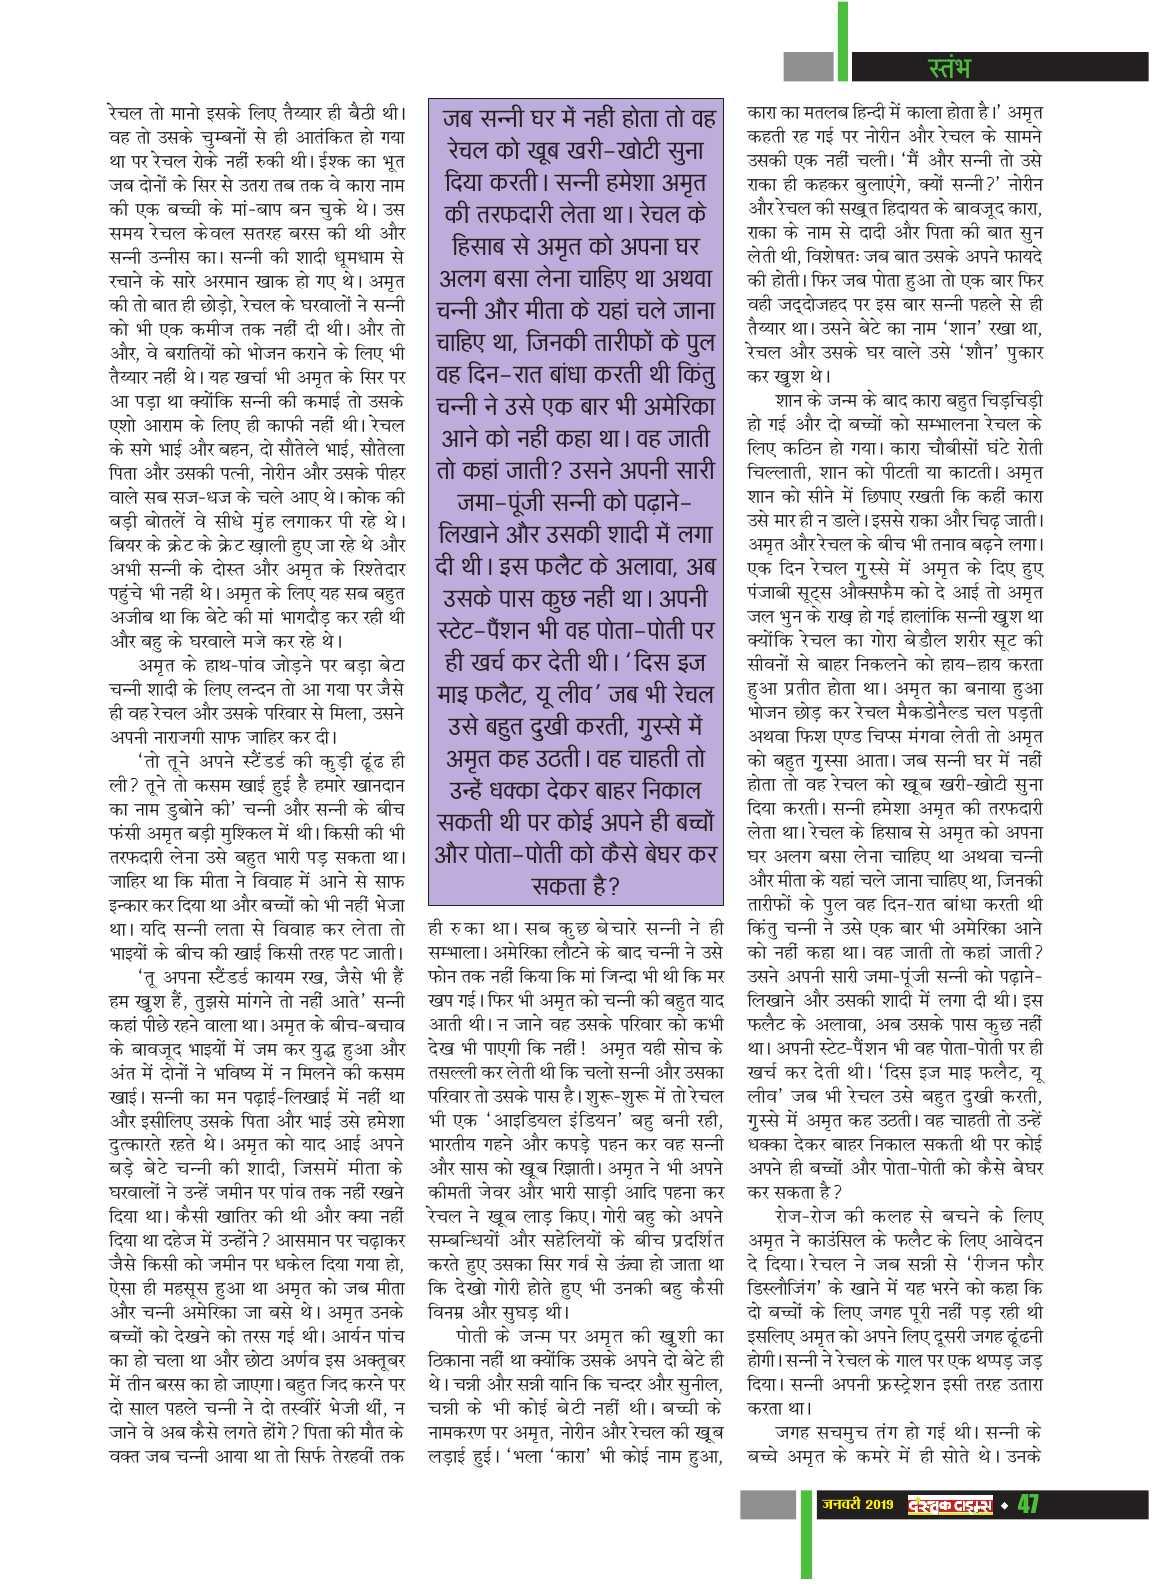 Dastak Times for E-Magazine 15 Jan 2019 new49